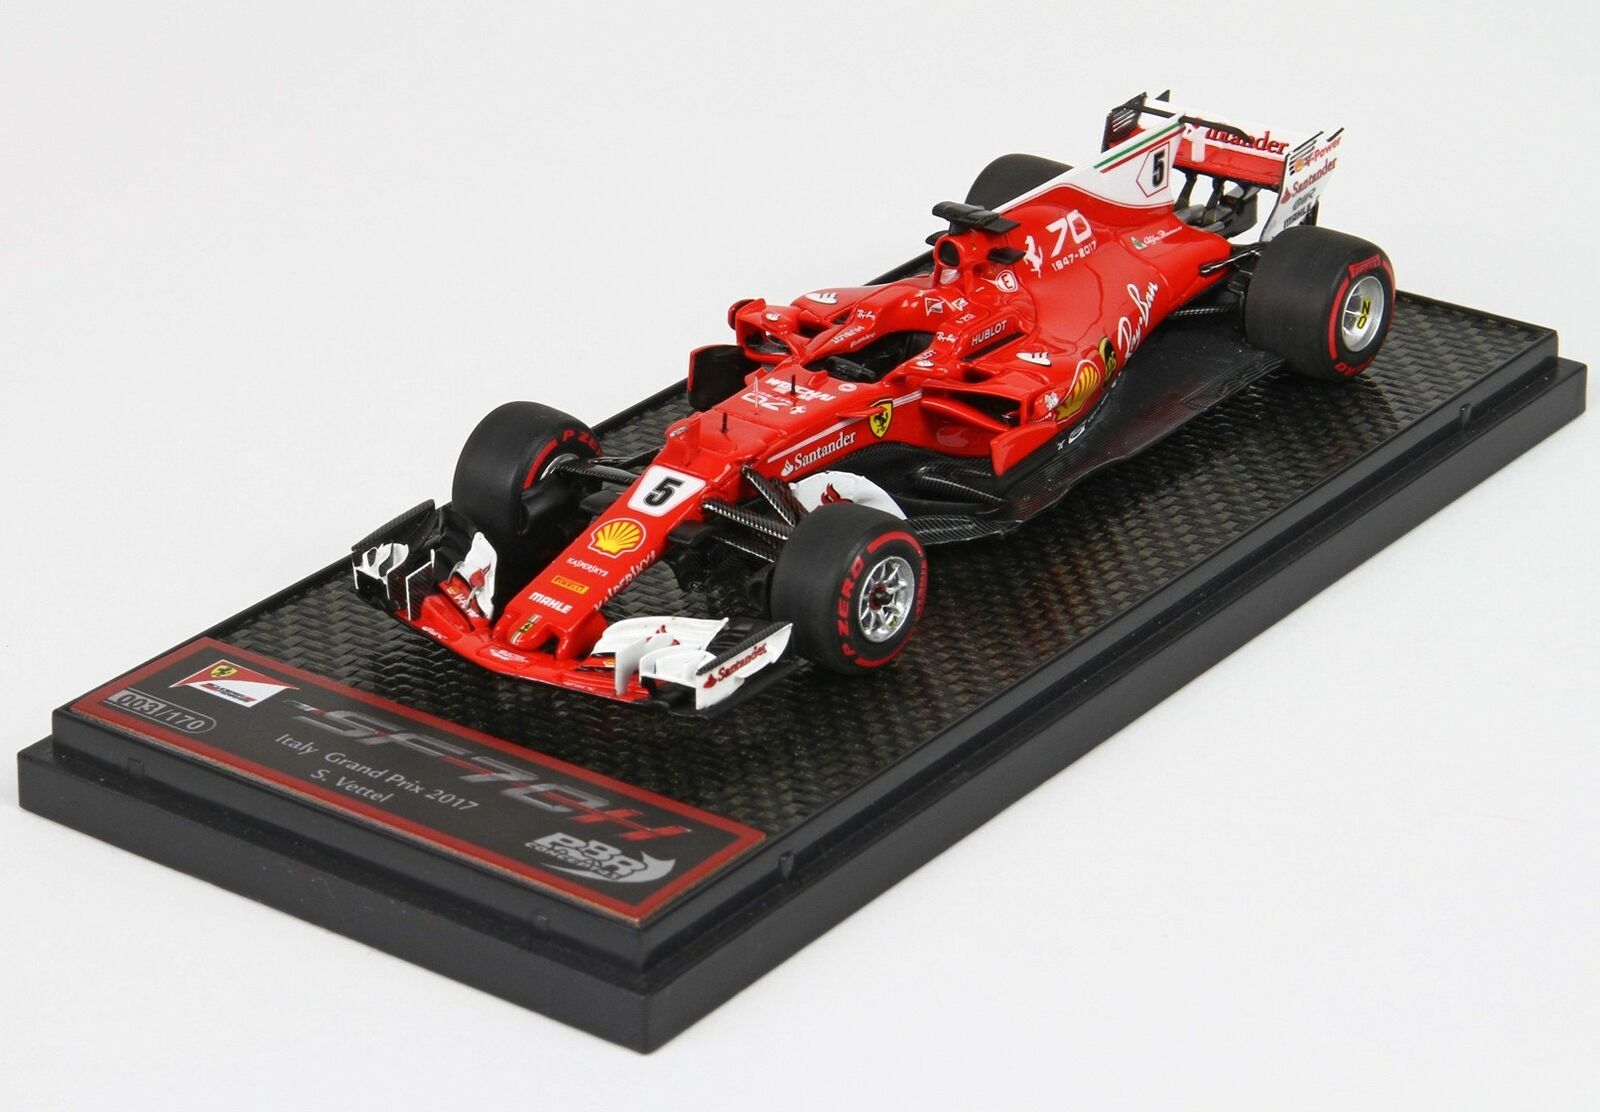 Ferrari F1 Sf70H  5 Monza  Gp 2017 S.Vettel rot BBR 1 43 BBRC203A